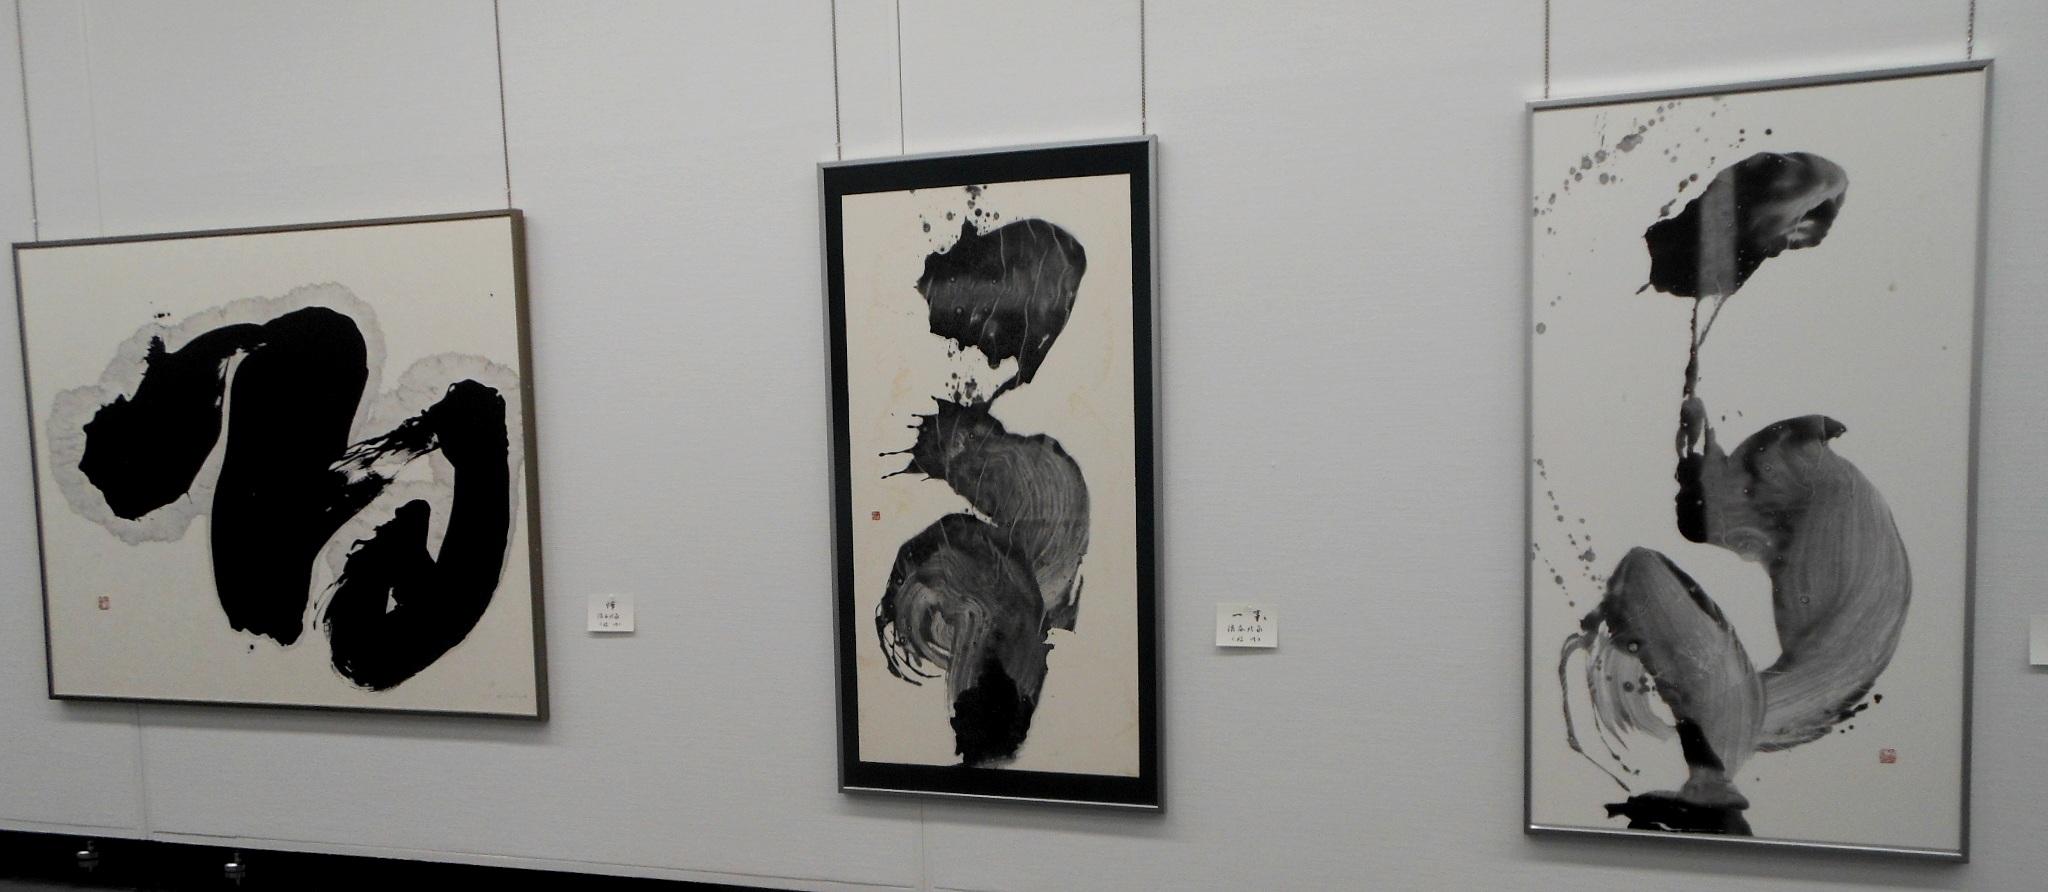 1690)「第26回 北海道墨人展」 市民ギャラリー 4月4日(水)~4月8日(日) _f0126829_1535887.jpg